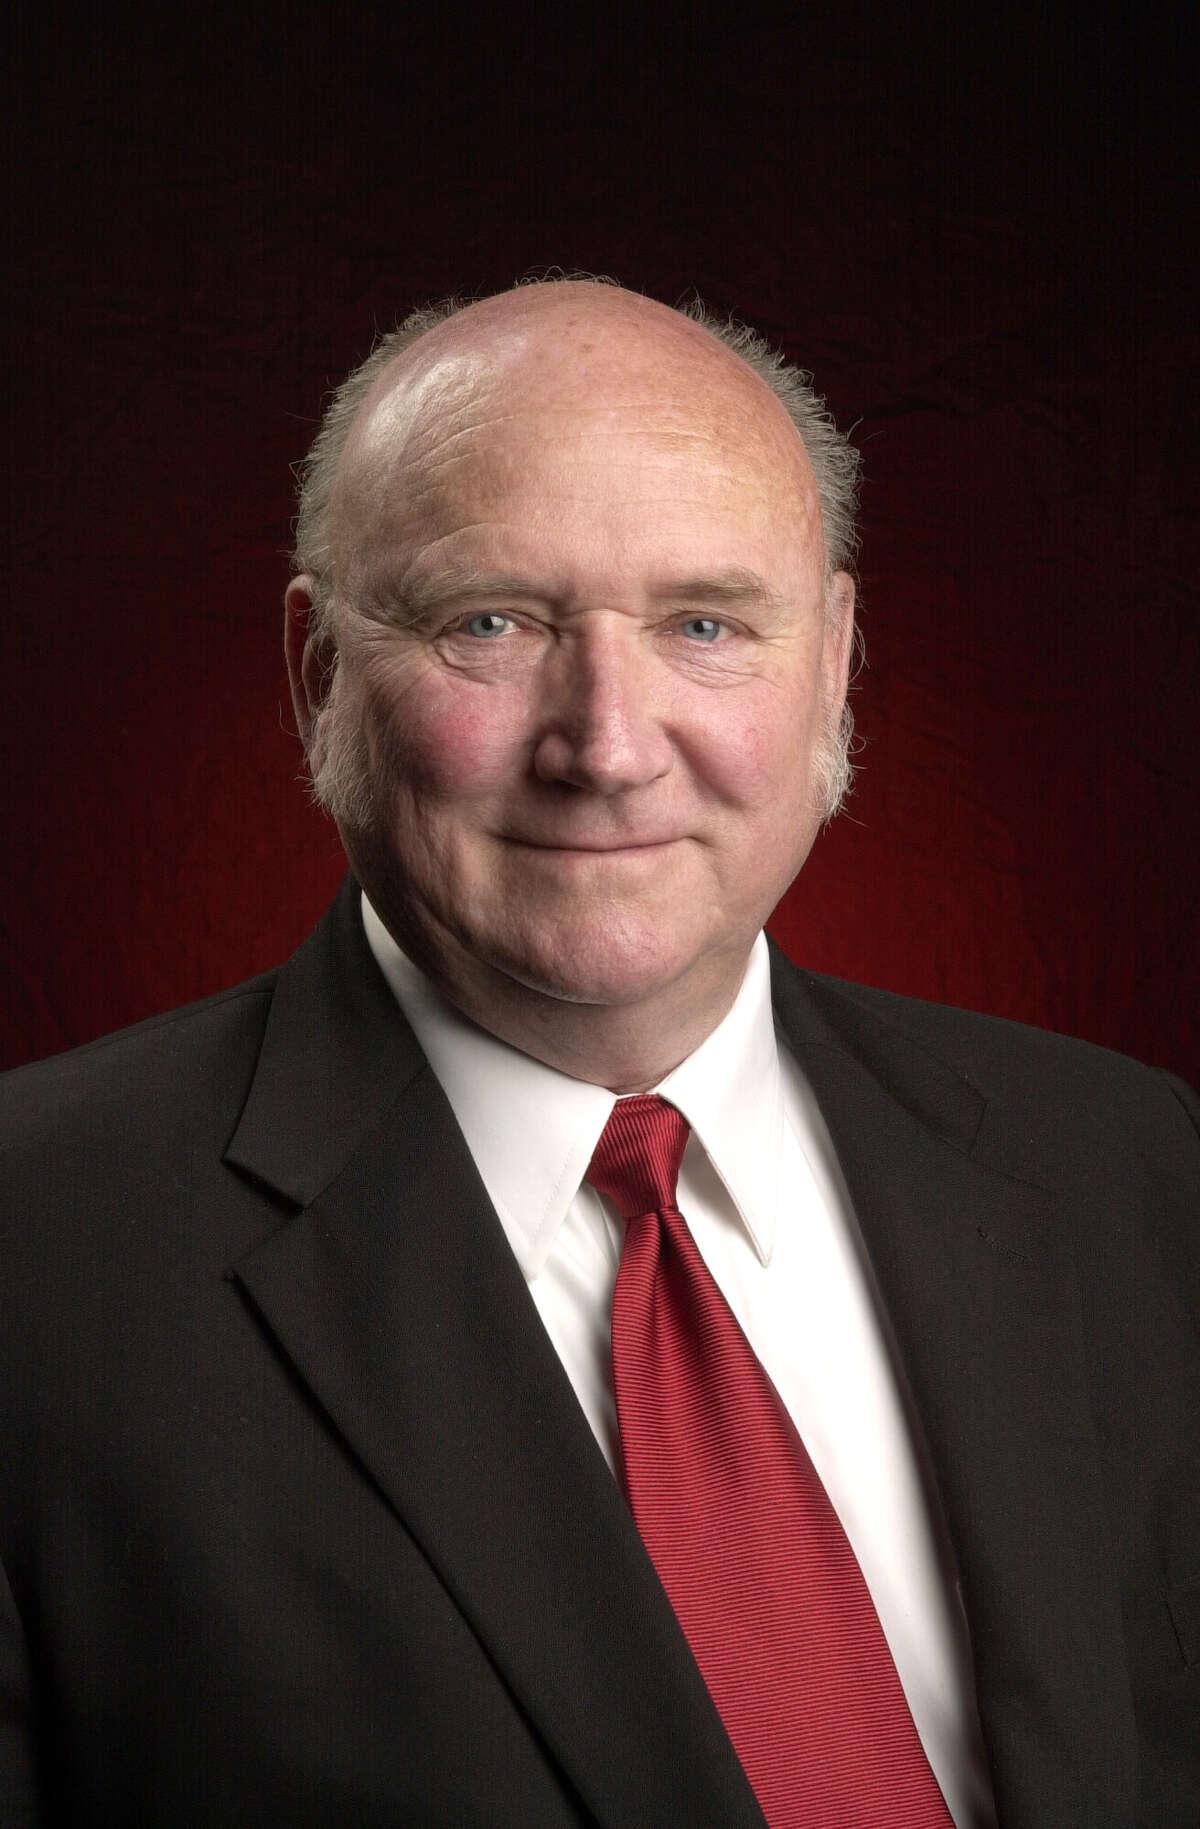 Odessan Dick Saulsbury, founder of Saulsbury Industries, will receive the Hearst Energy Awards lifetime achievement award.